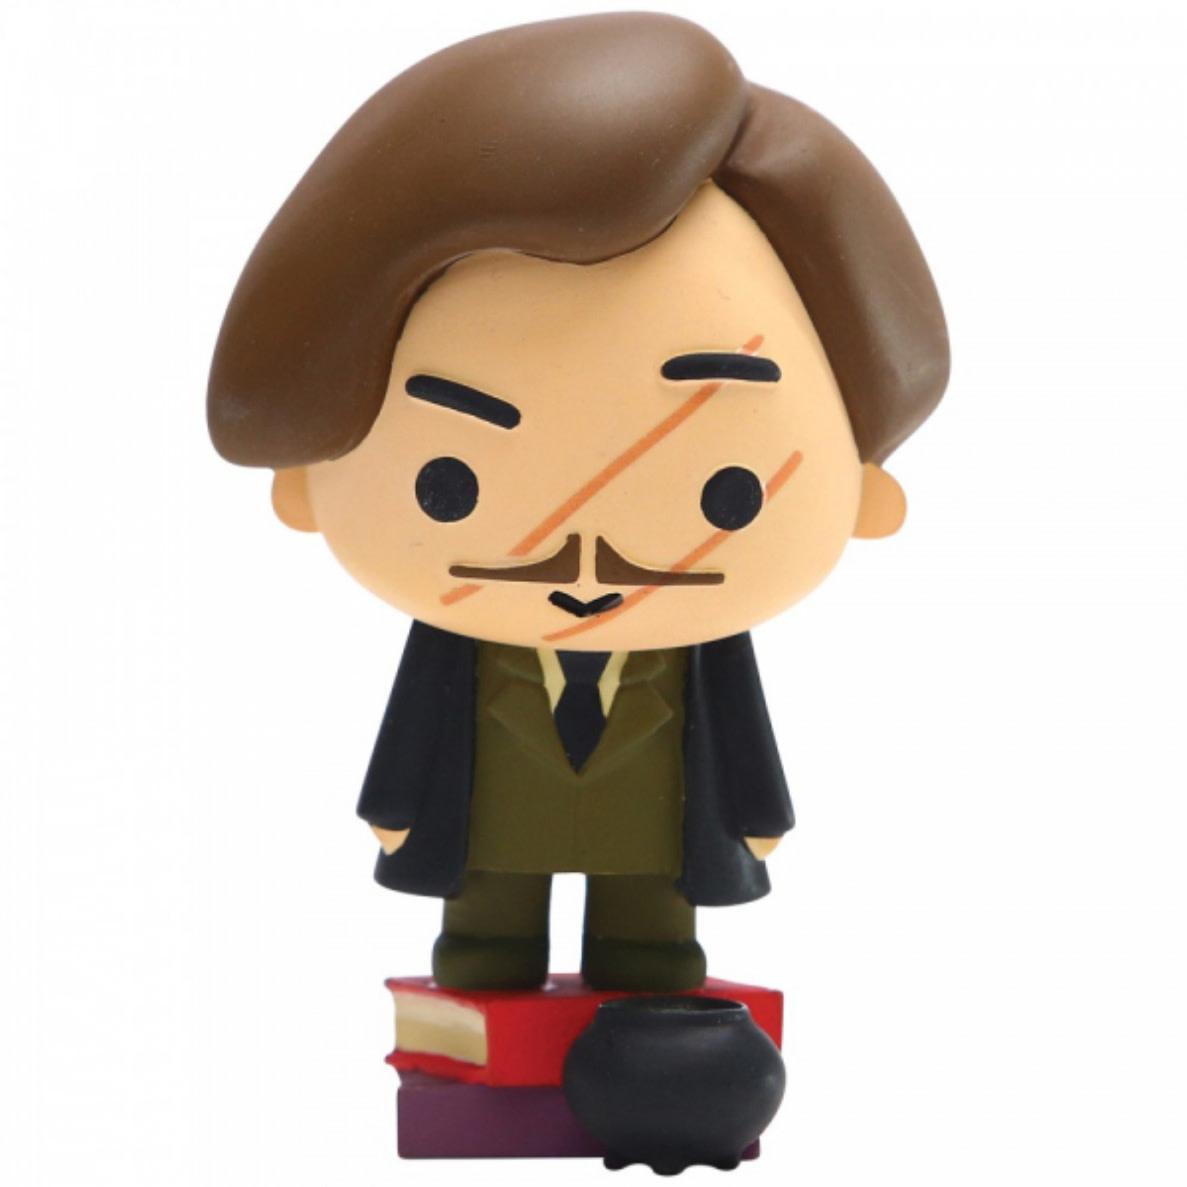 enesco Harry Potter : Lupin Charm Figurine